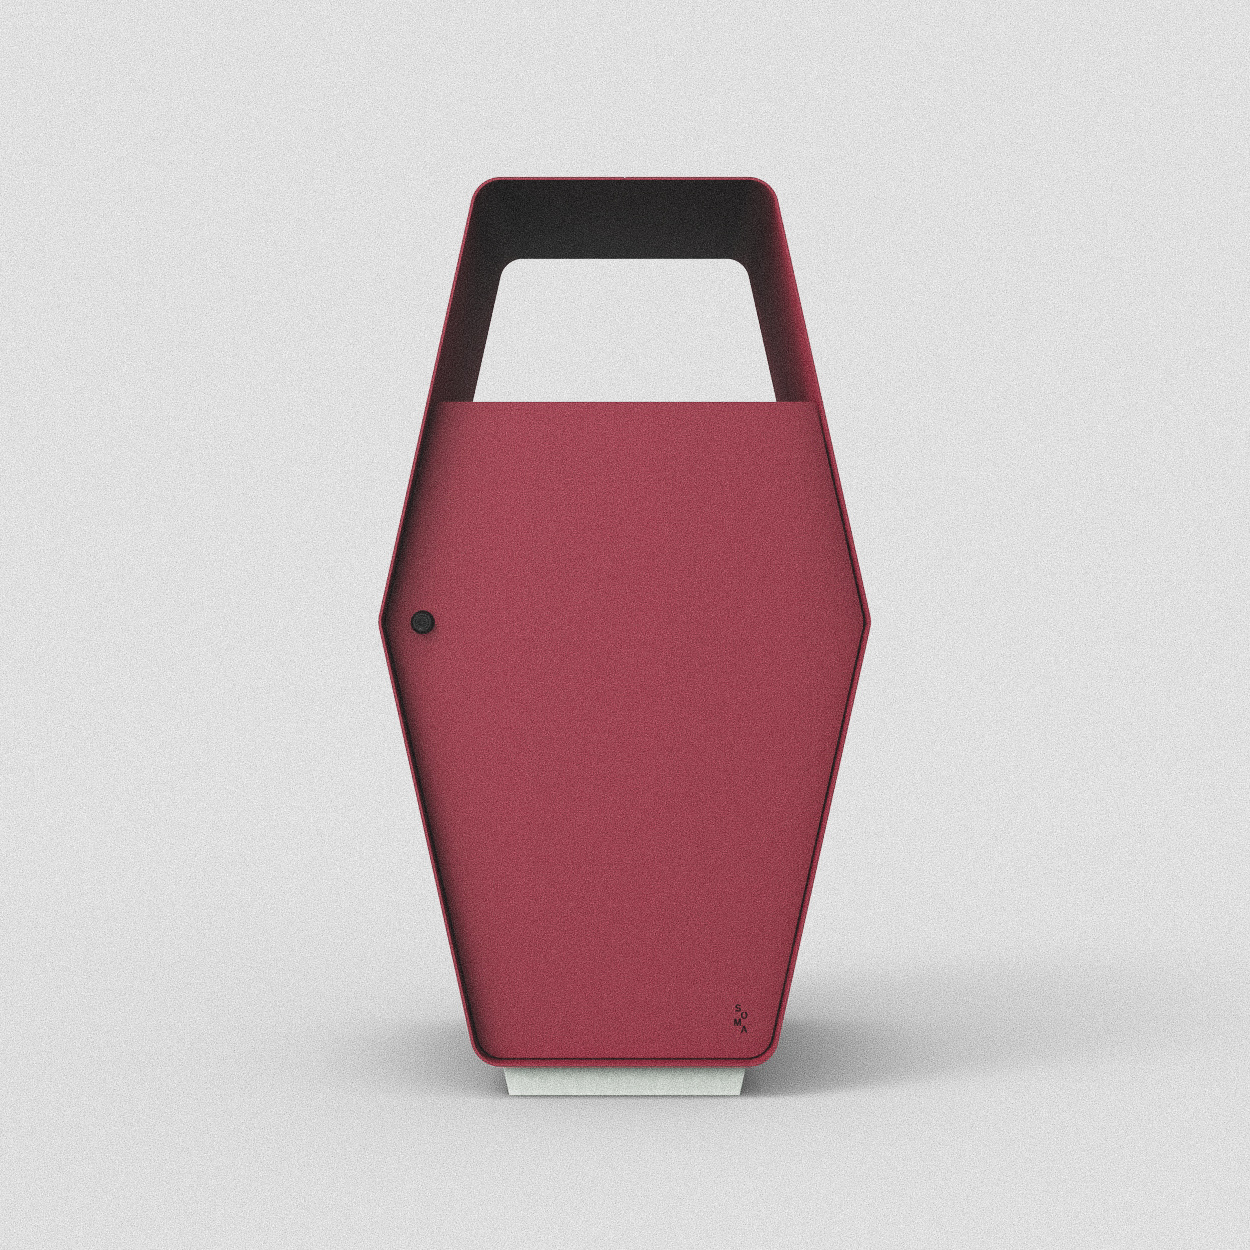 Inkast: Restavfall alt. kompost / Standardfärg: Lingon